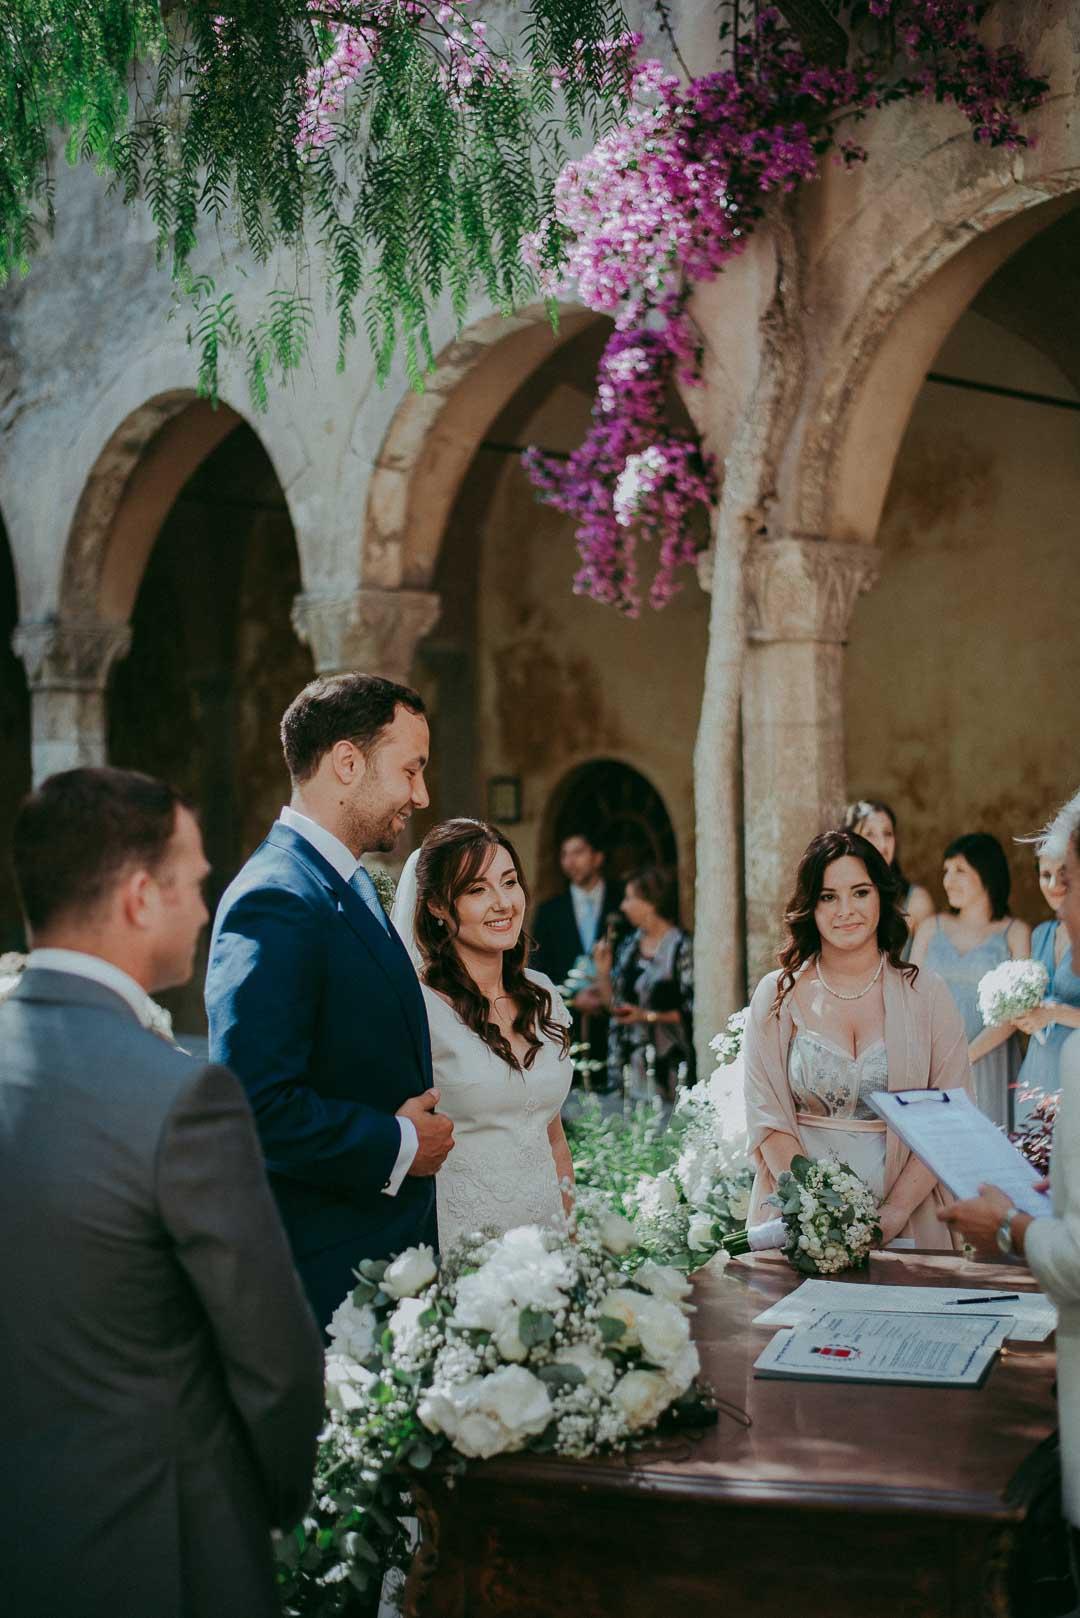 wedding-photographer-destination-fineart-bespoke-reportage-sorrento-parcodeiprincipi-vivianeizzo-spazio46-39